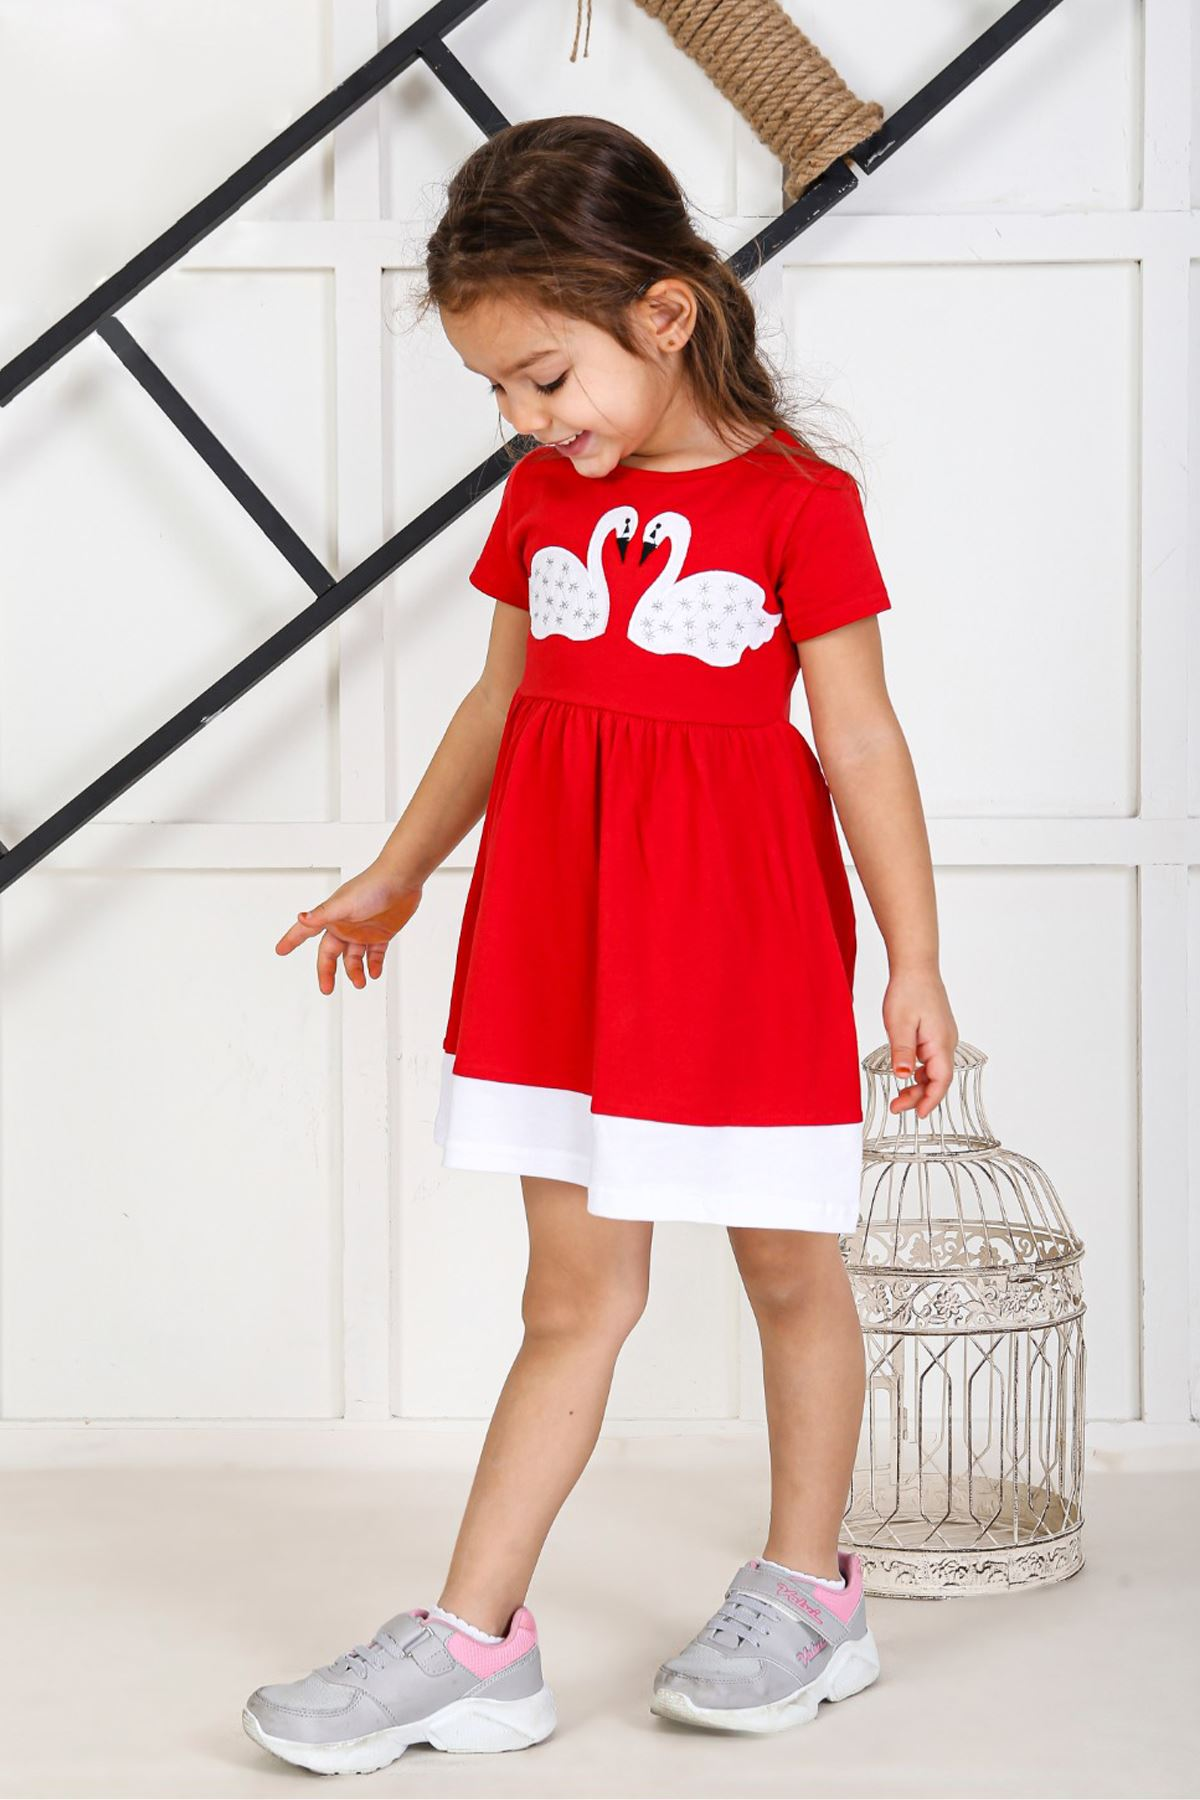 Red Kids 2021 Girls Girls' Skirt Dress Suits Cotton Casual Summer Children Clothing Girl Dress Cute Holiday Outfits Sport Models